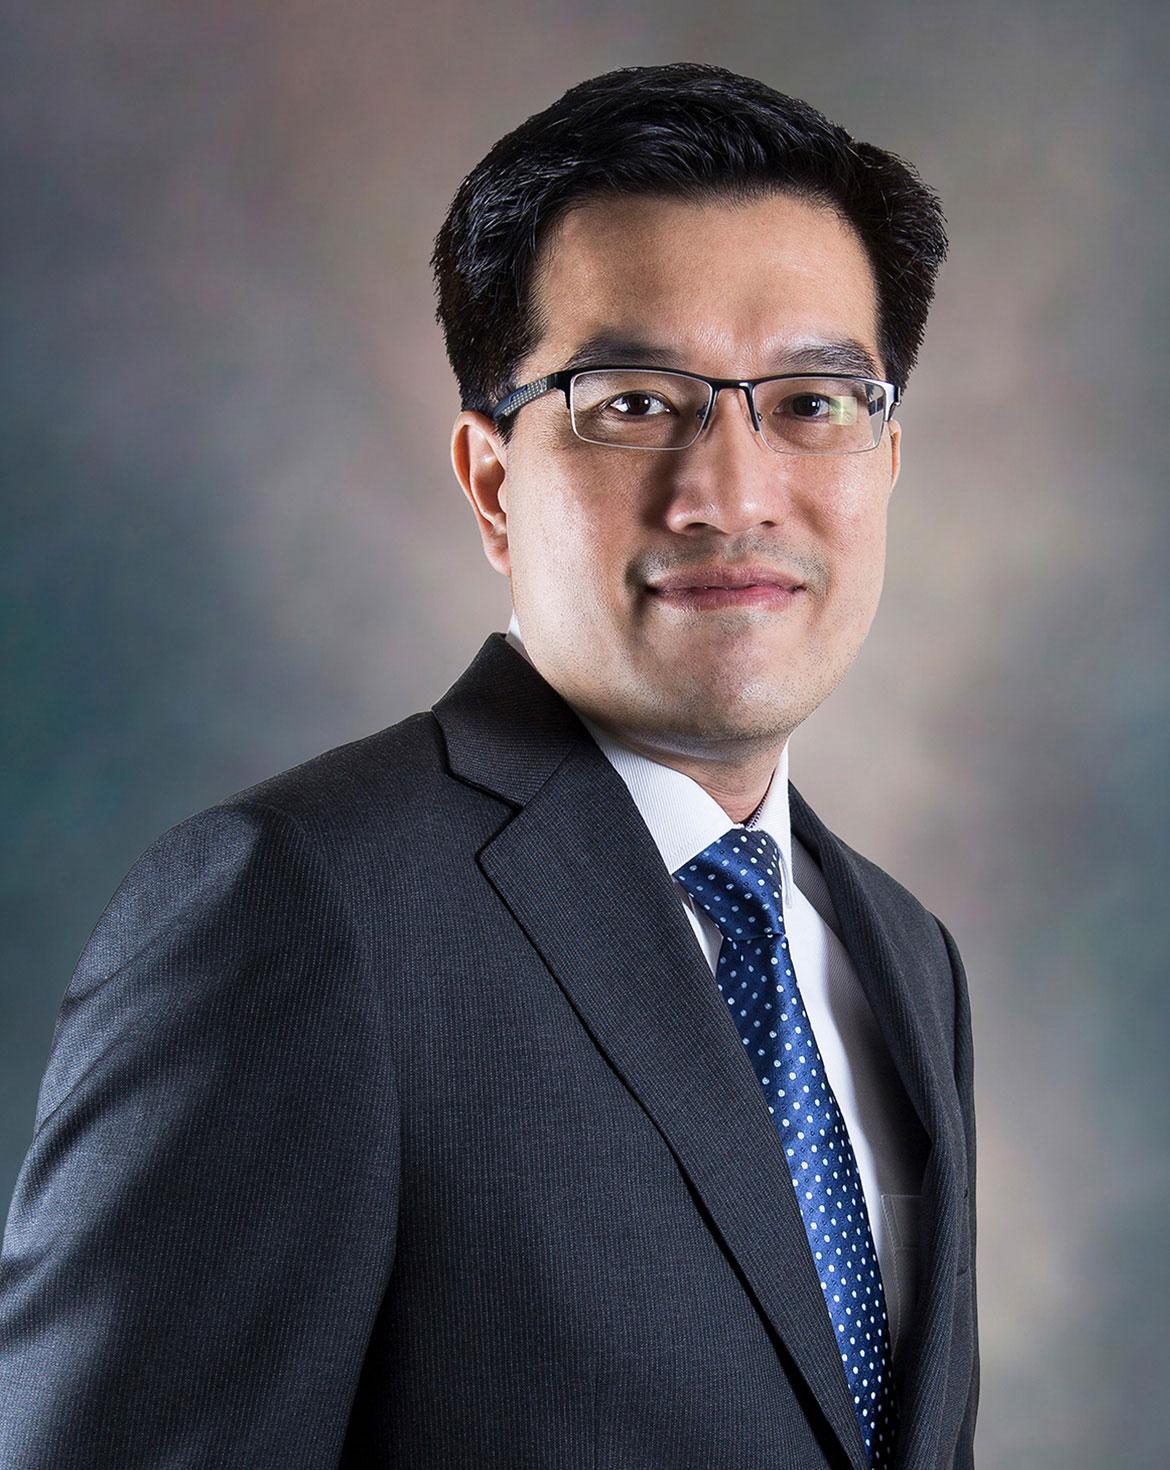 DR POH CHOO HEAN